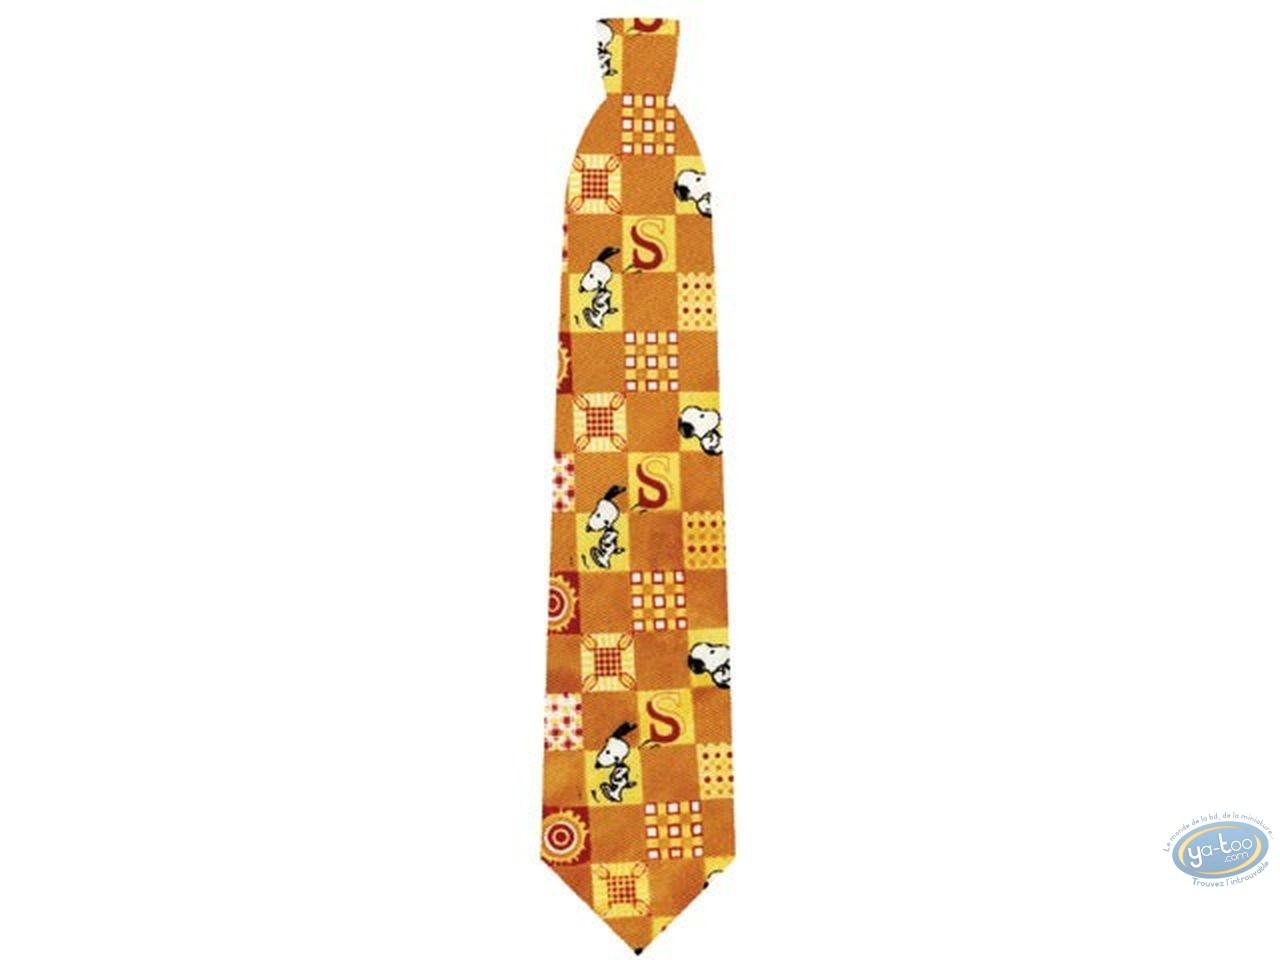 Vêtement, Snoopy : Cravate, Snoopy orange carreau